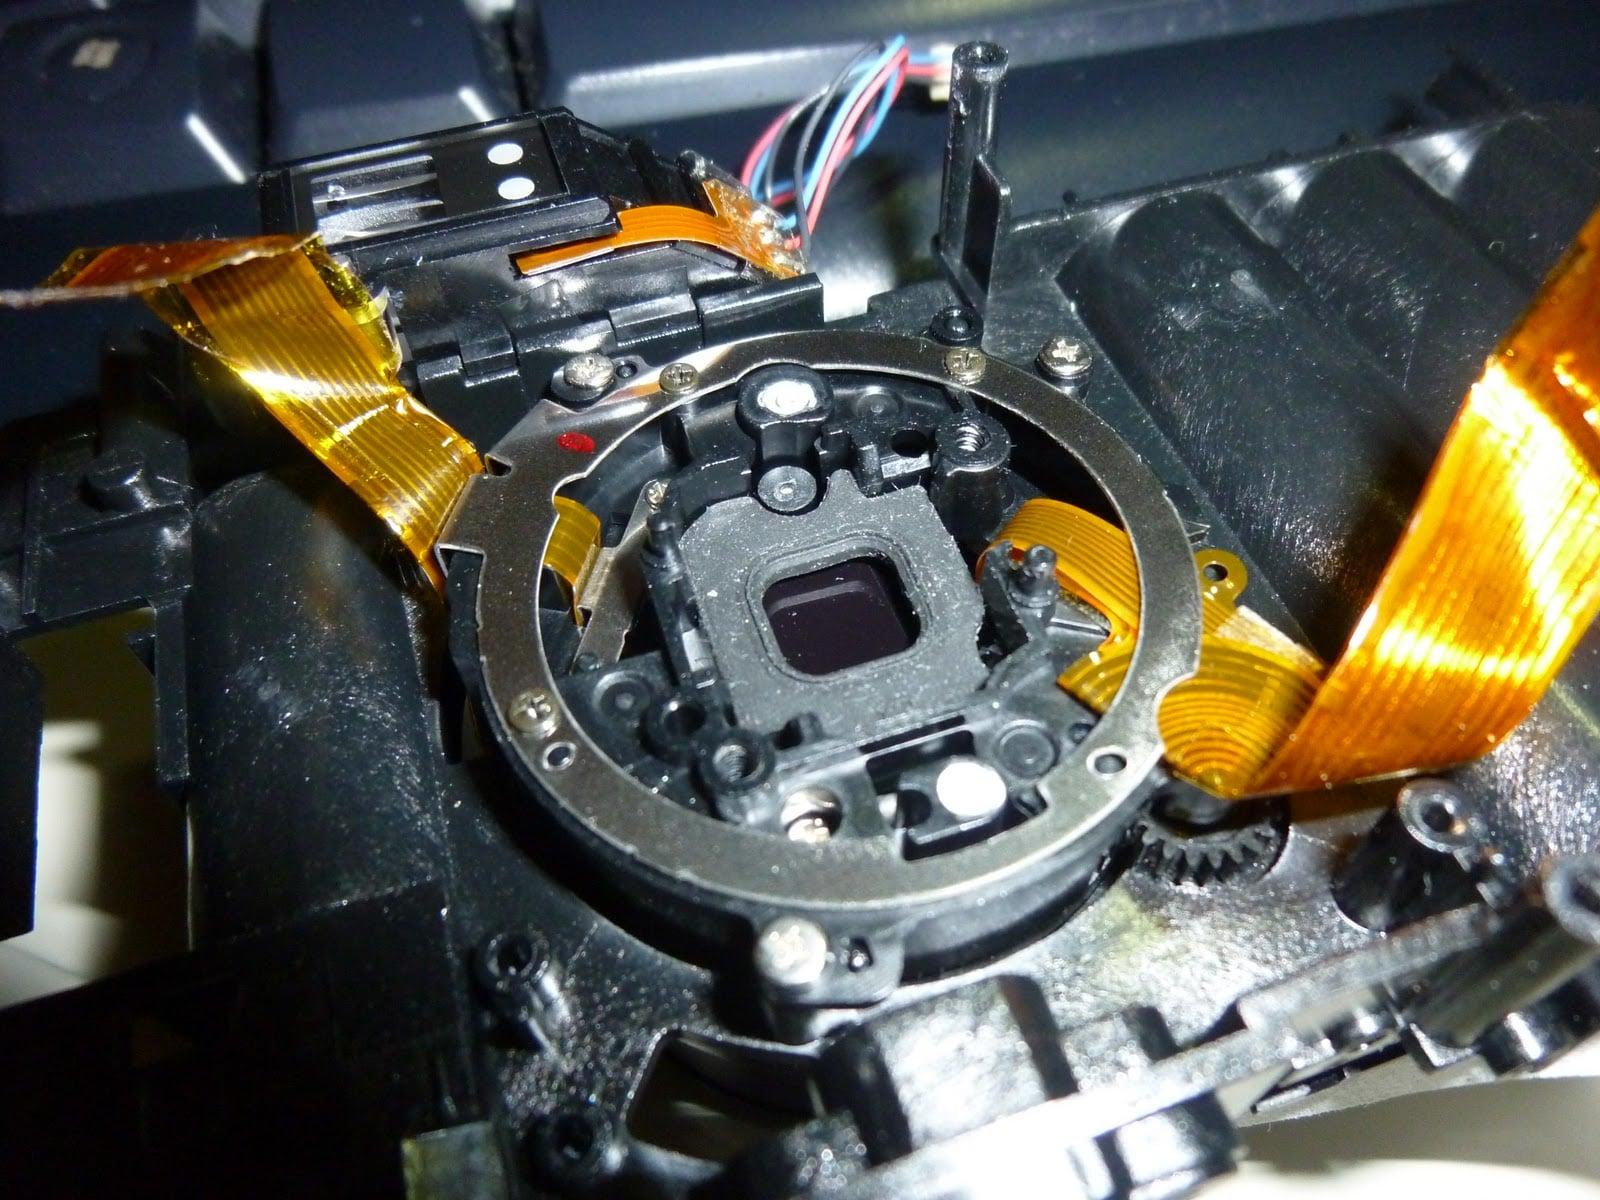 RCA Digital Camera CDS6300 22 拆解 RCA 數位照相機拆解紀錄|改裝紅外線相機